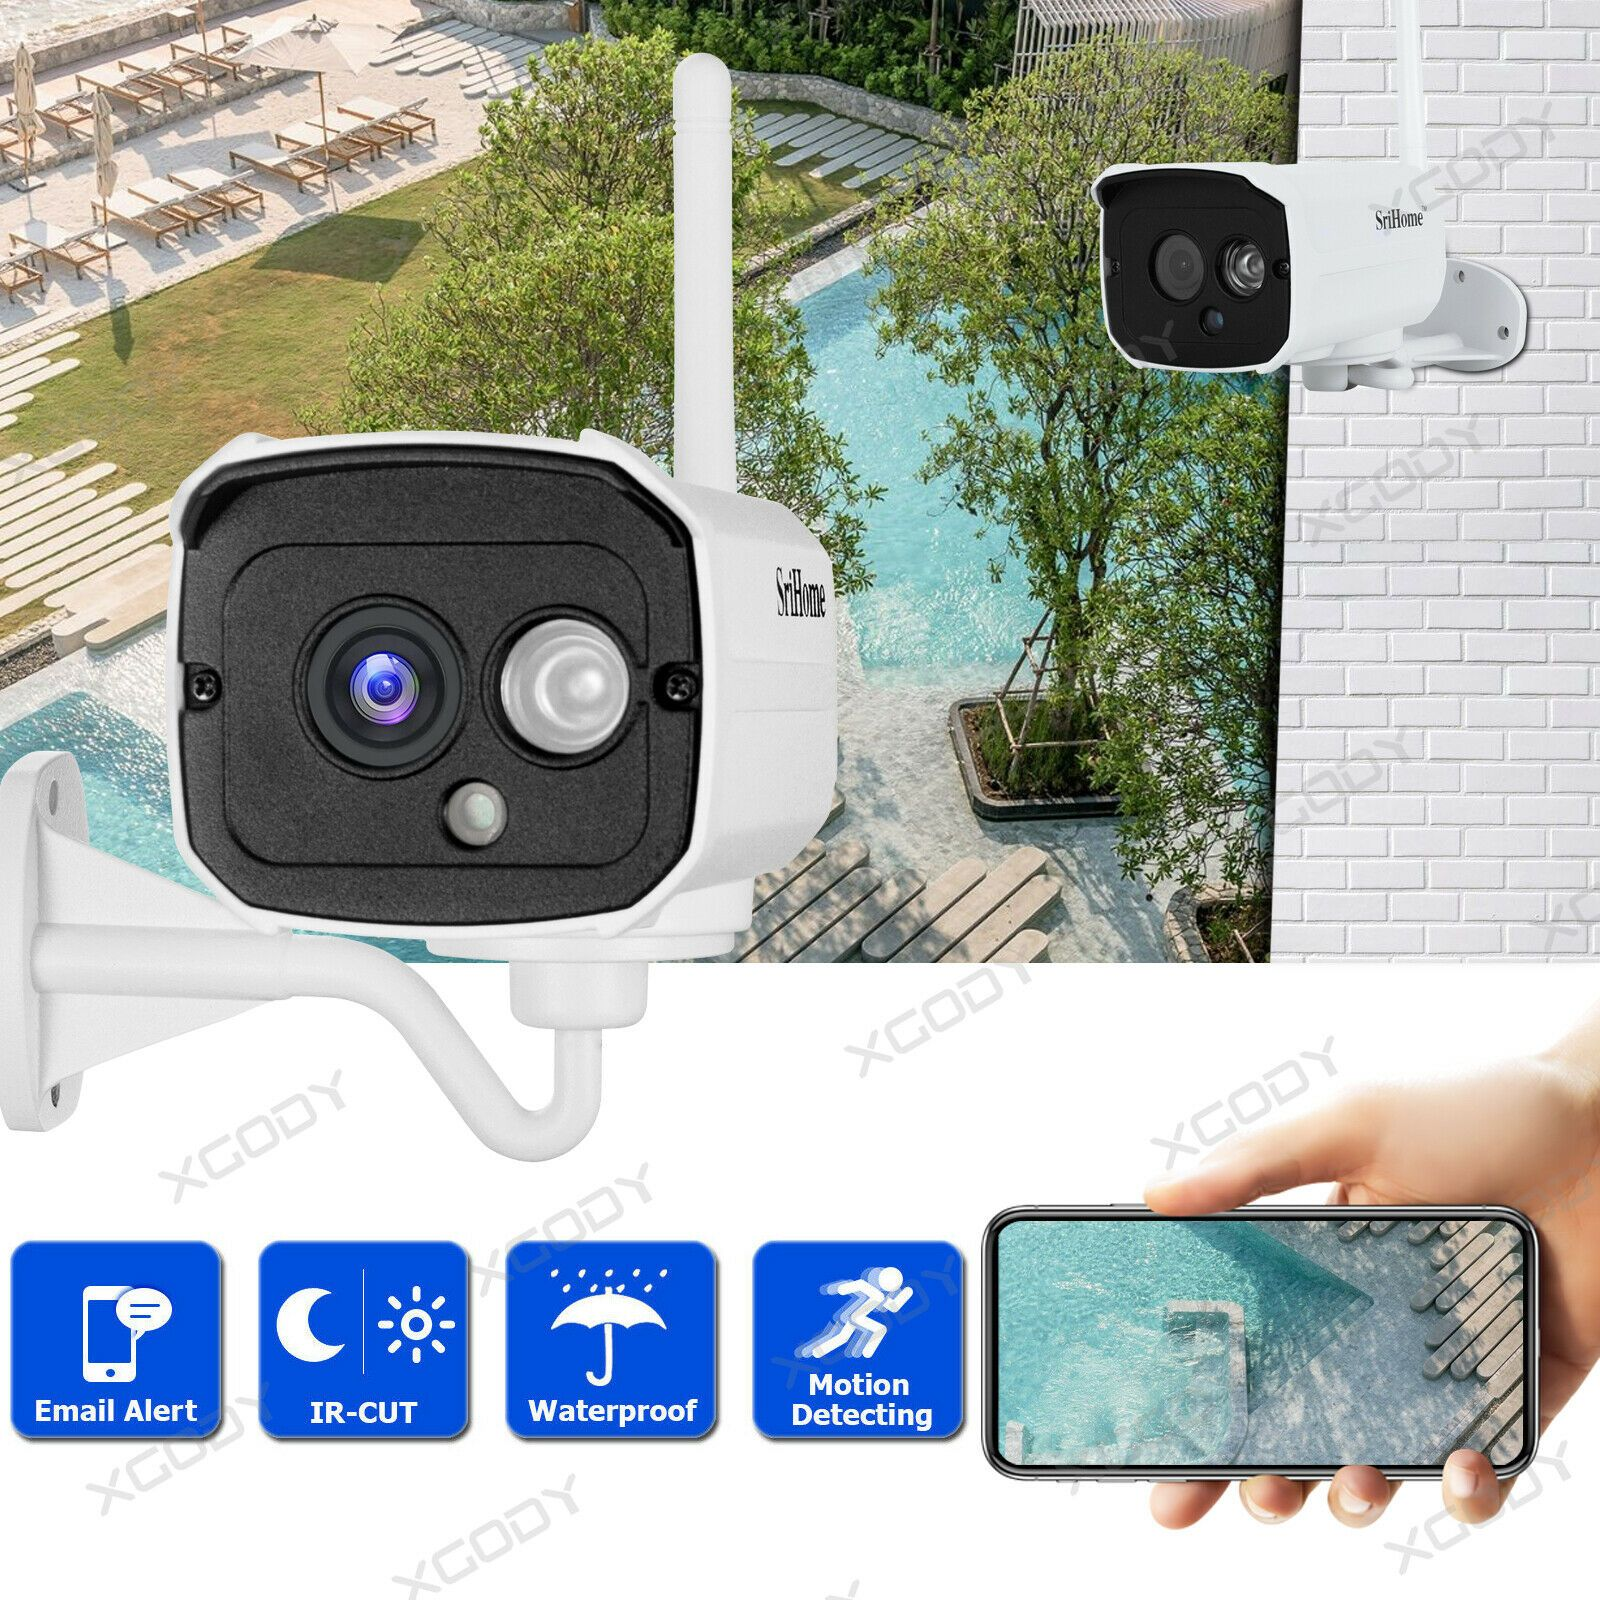 Wireless WiFi IP Kamera Überwachungskamera Webcam Wlan Funk Camera Nachtsicht DE